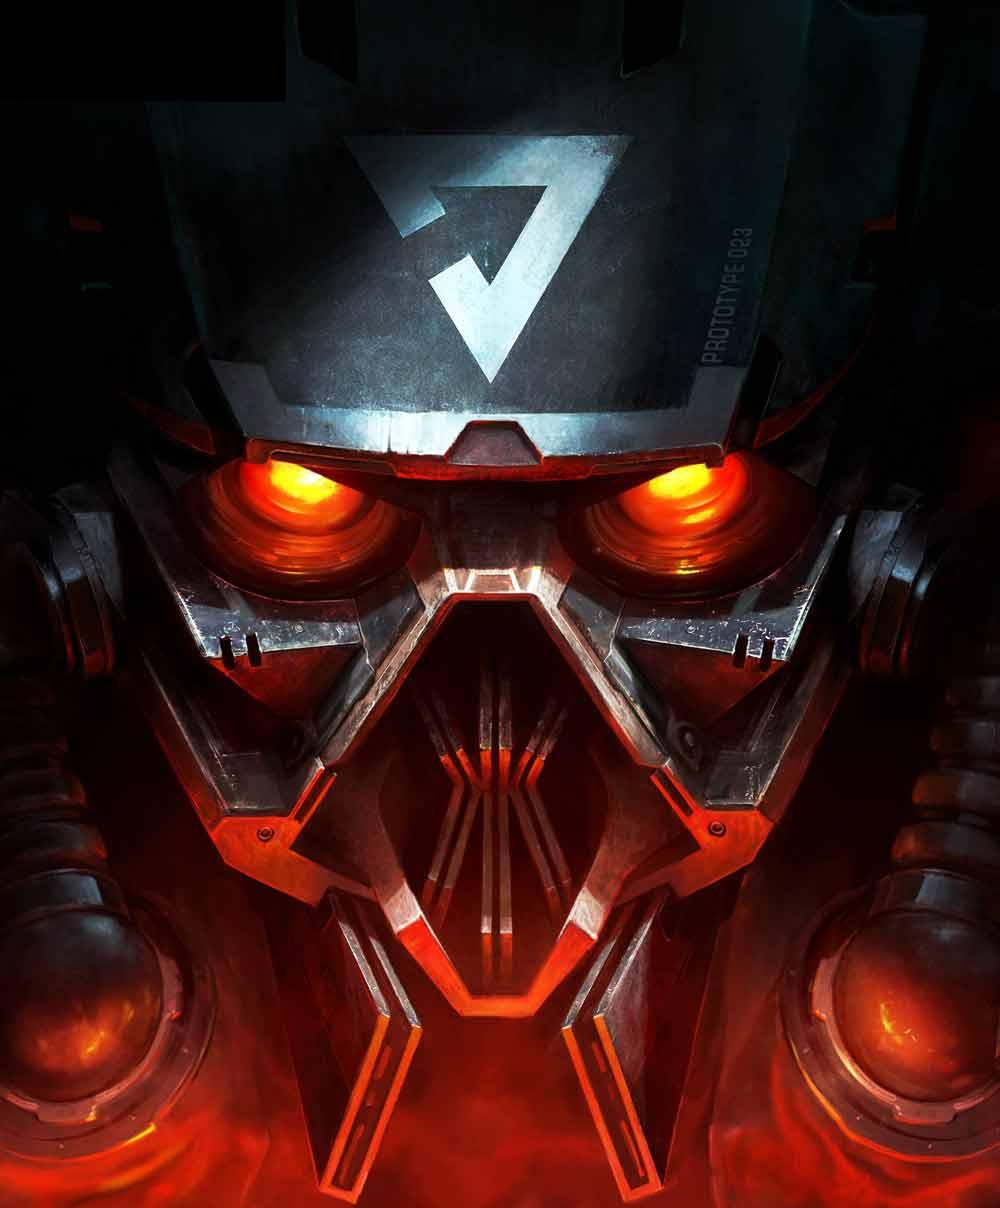 [Конкурс] Разработчики Killzone - поведали миру плюшки PS4